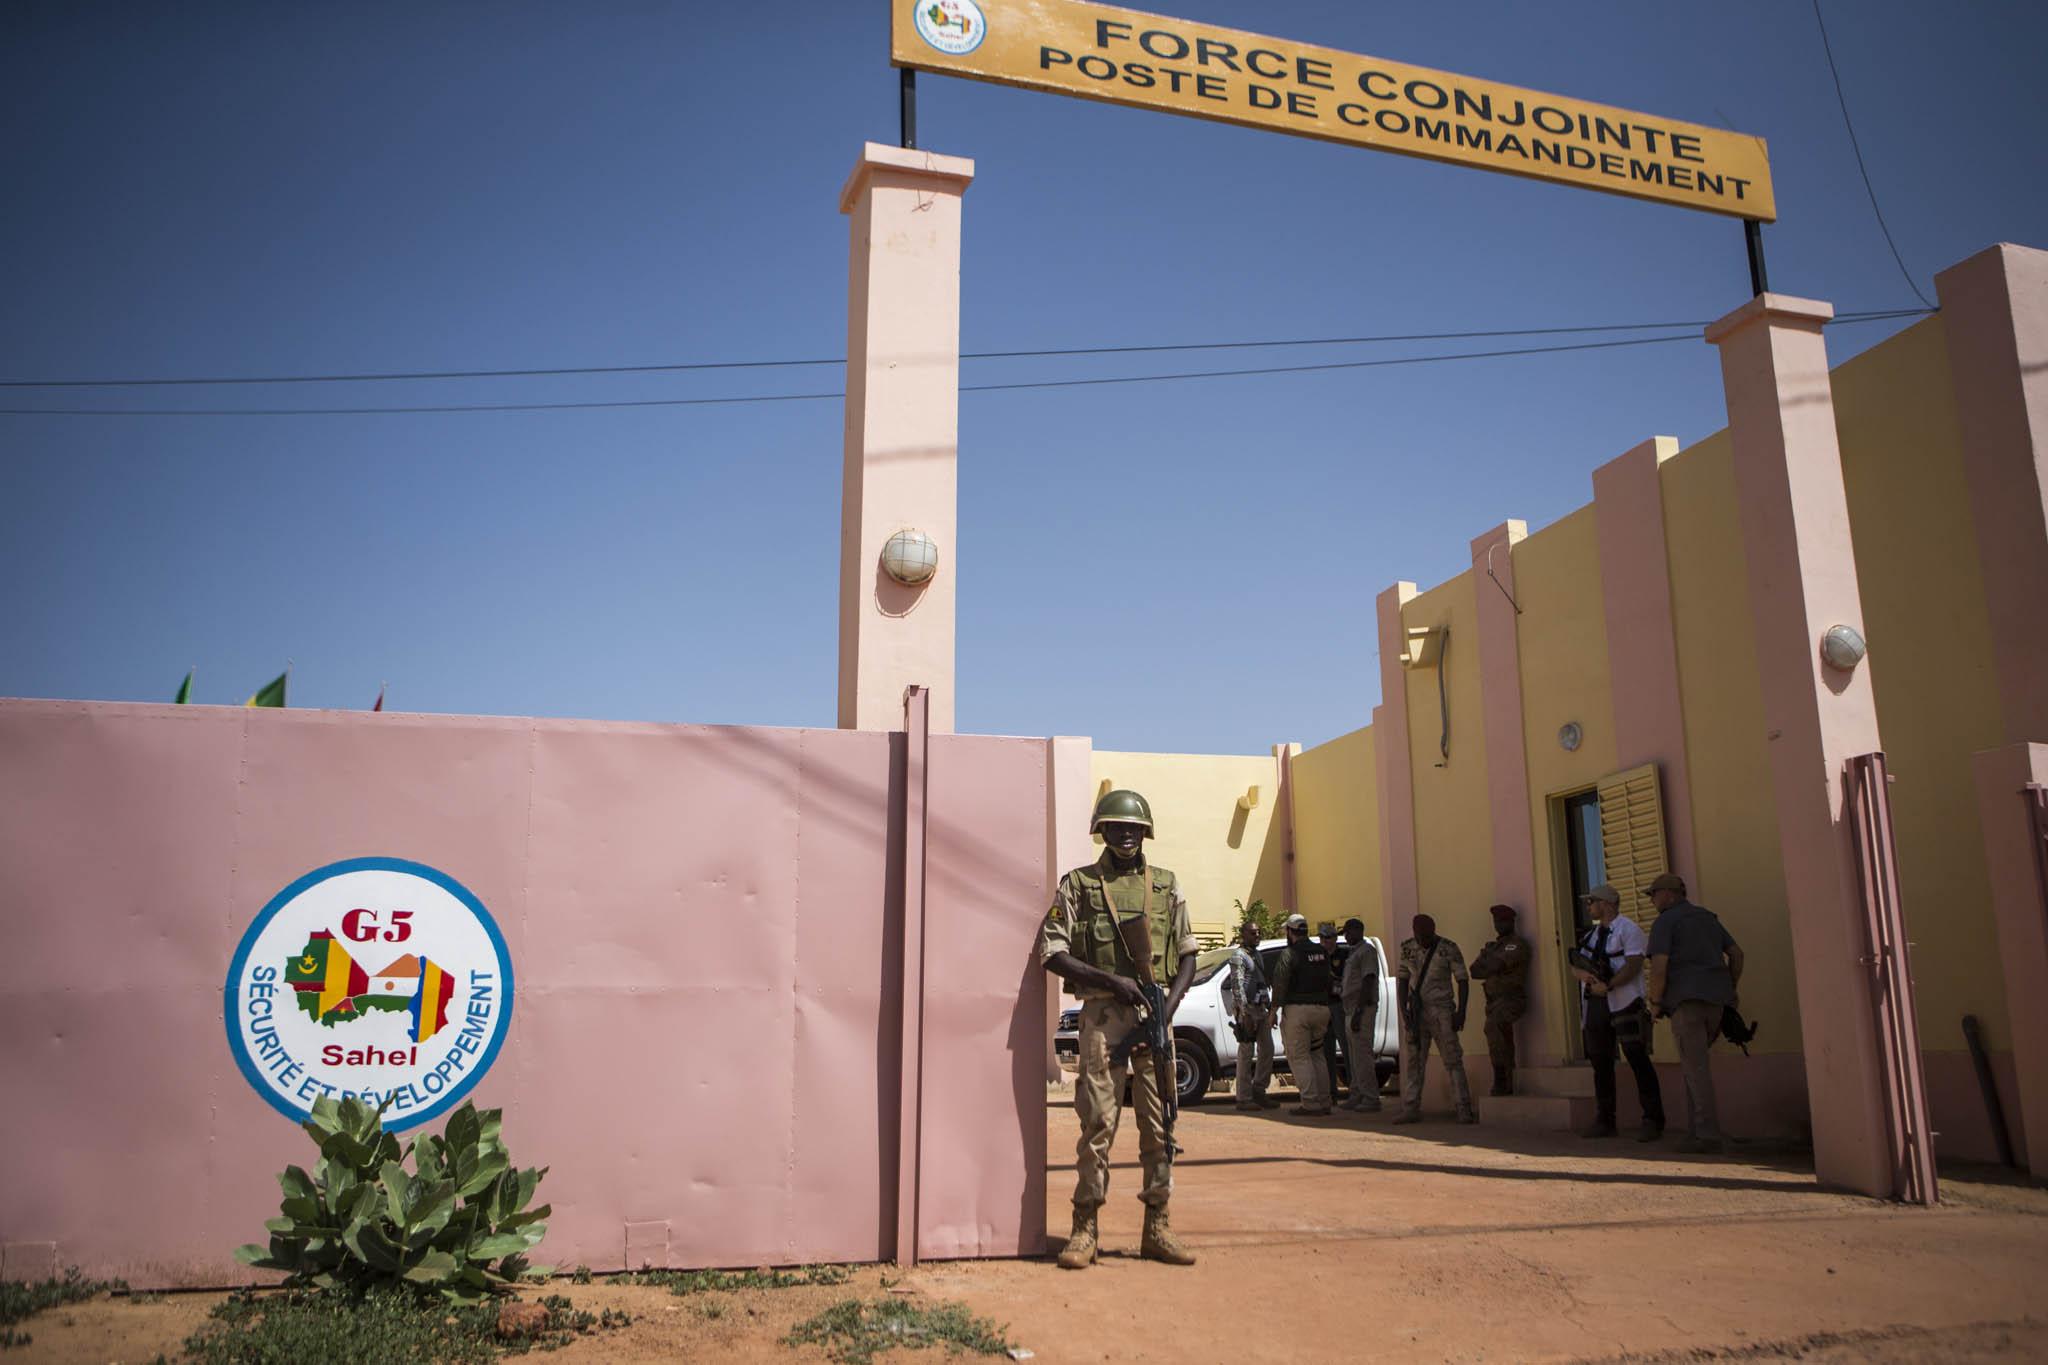 Quartier generale della Force G5 Sahel a Sévaré, Mali